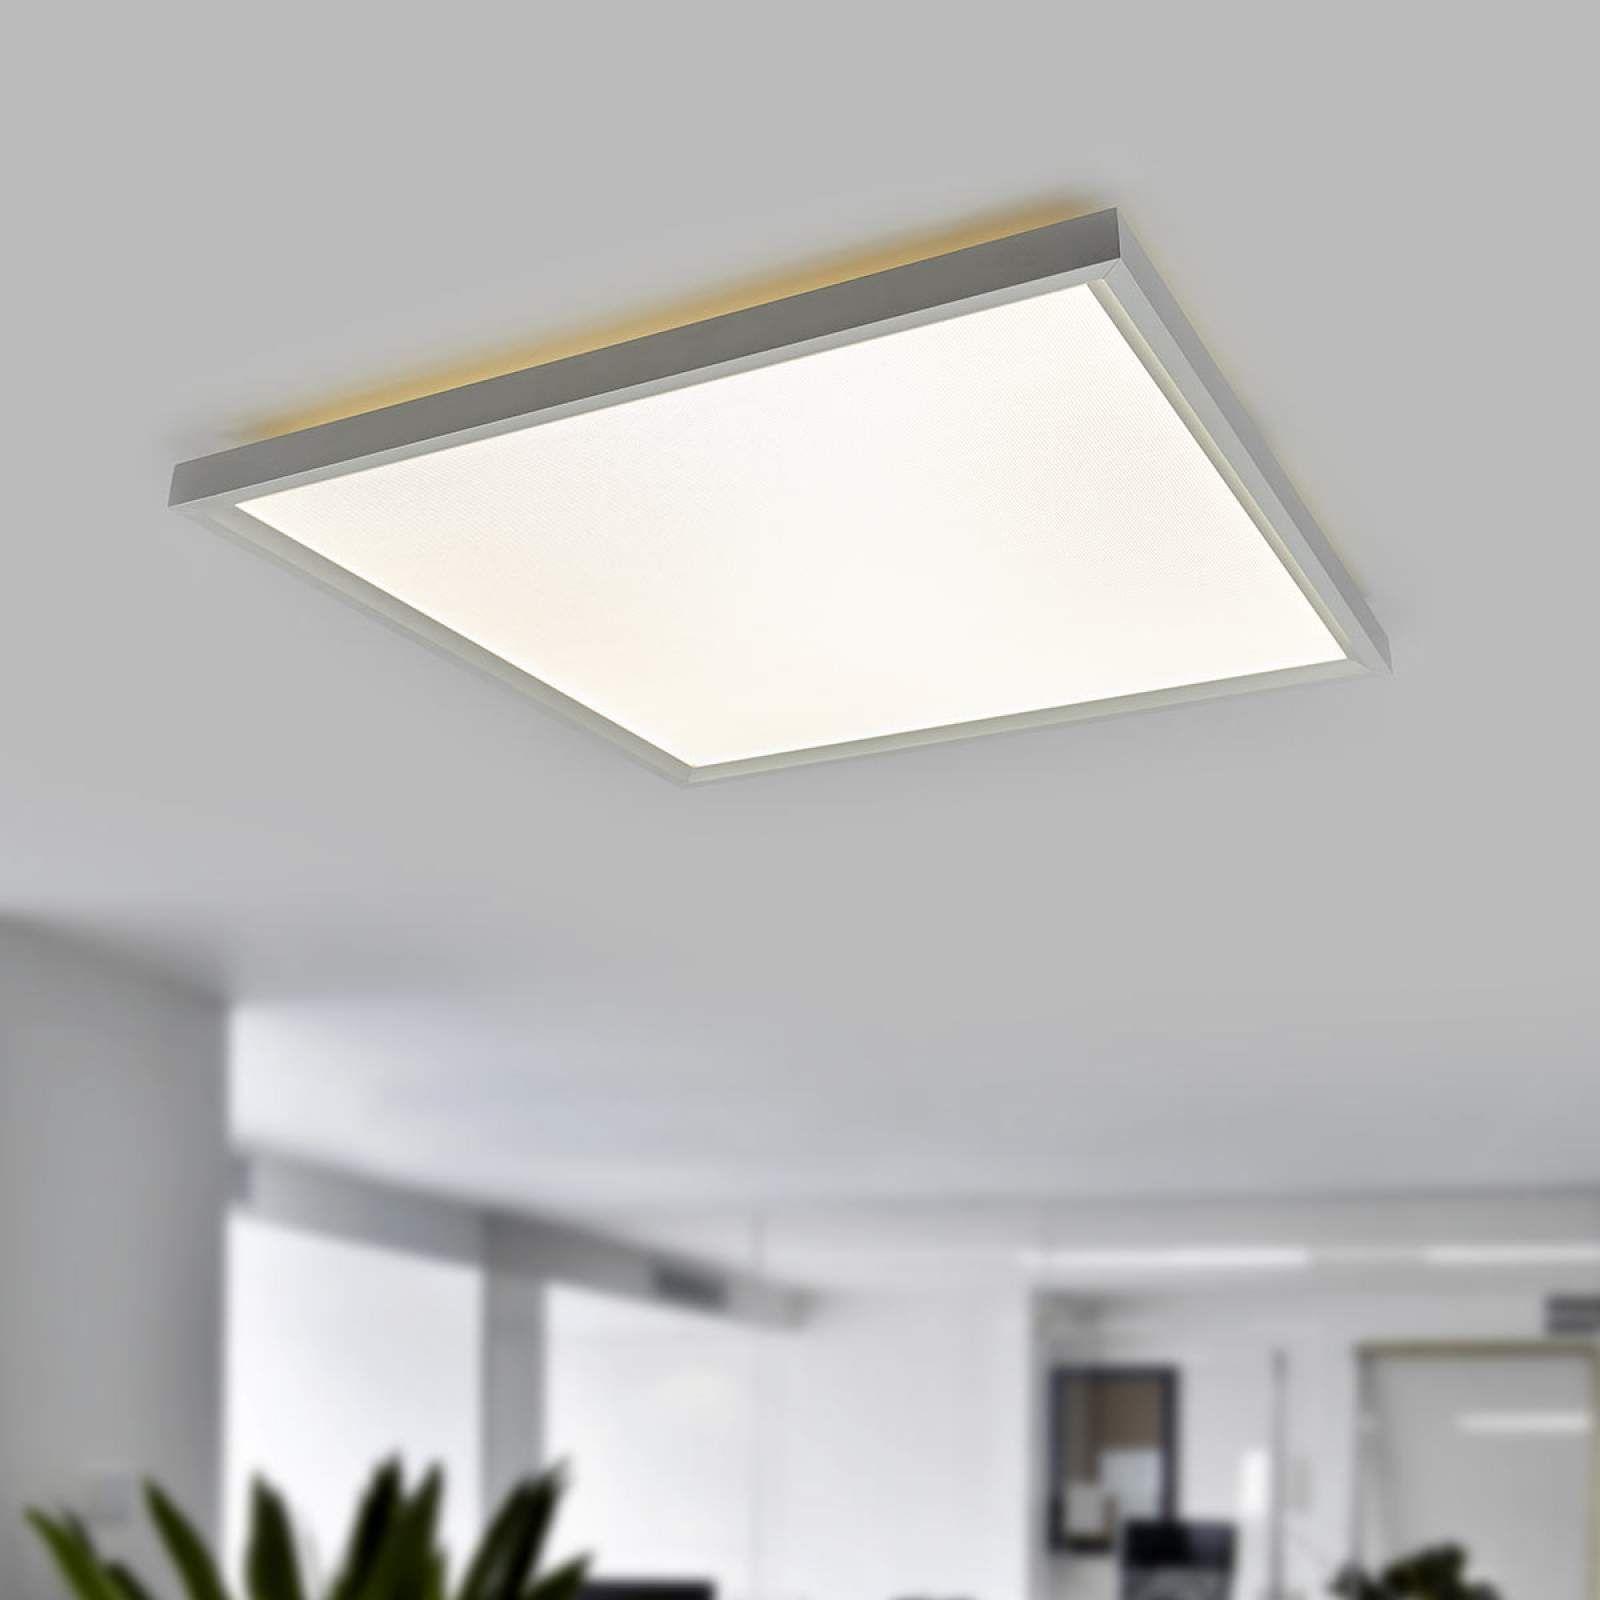 Quadratische Led Burodeckenlampe Rick Dali 4 000k In 2020 Led Led Deckenlampen Moderne Deckenbeleuchtung